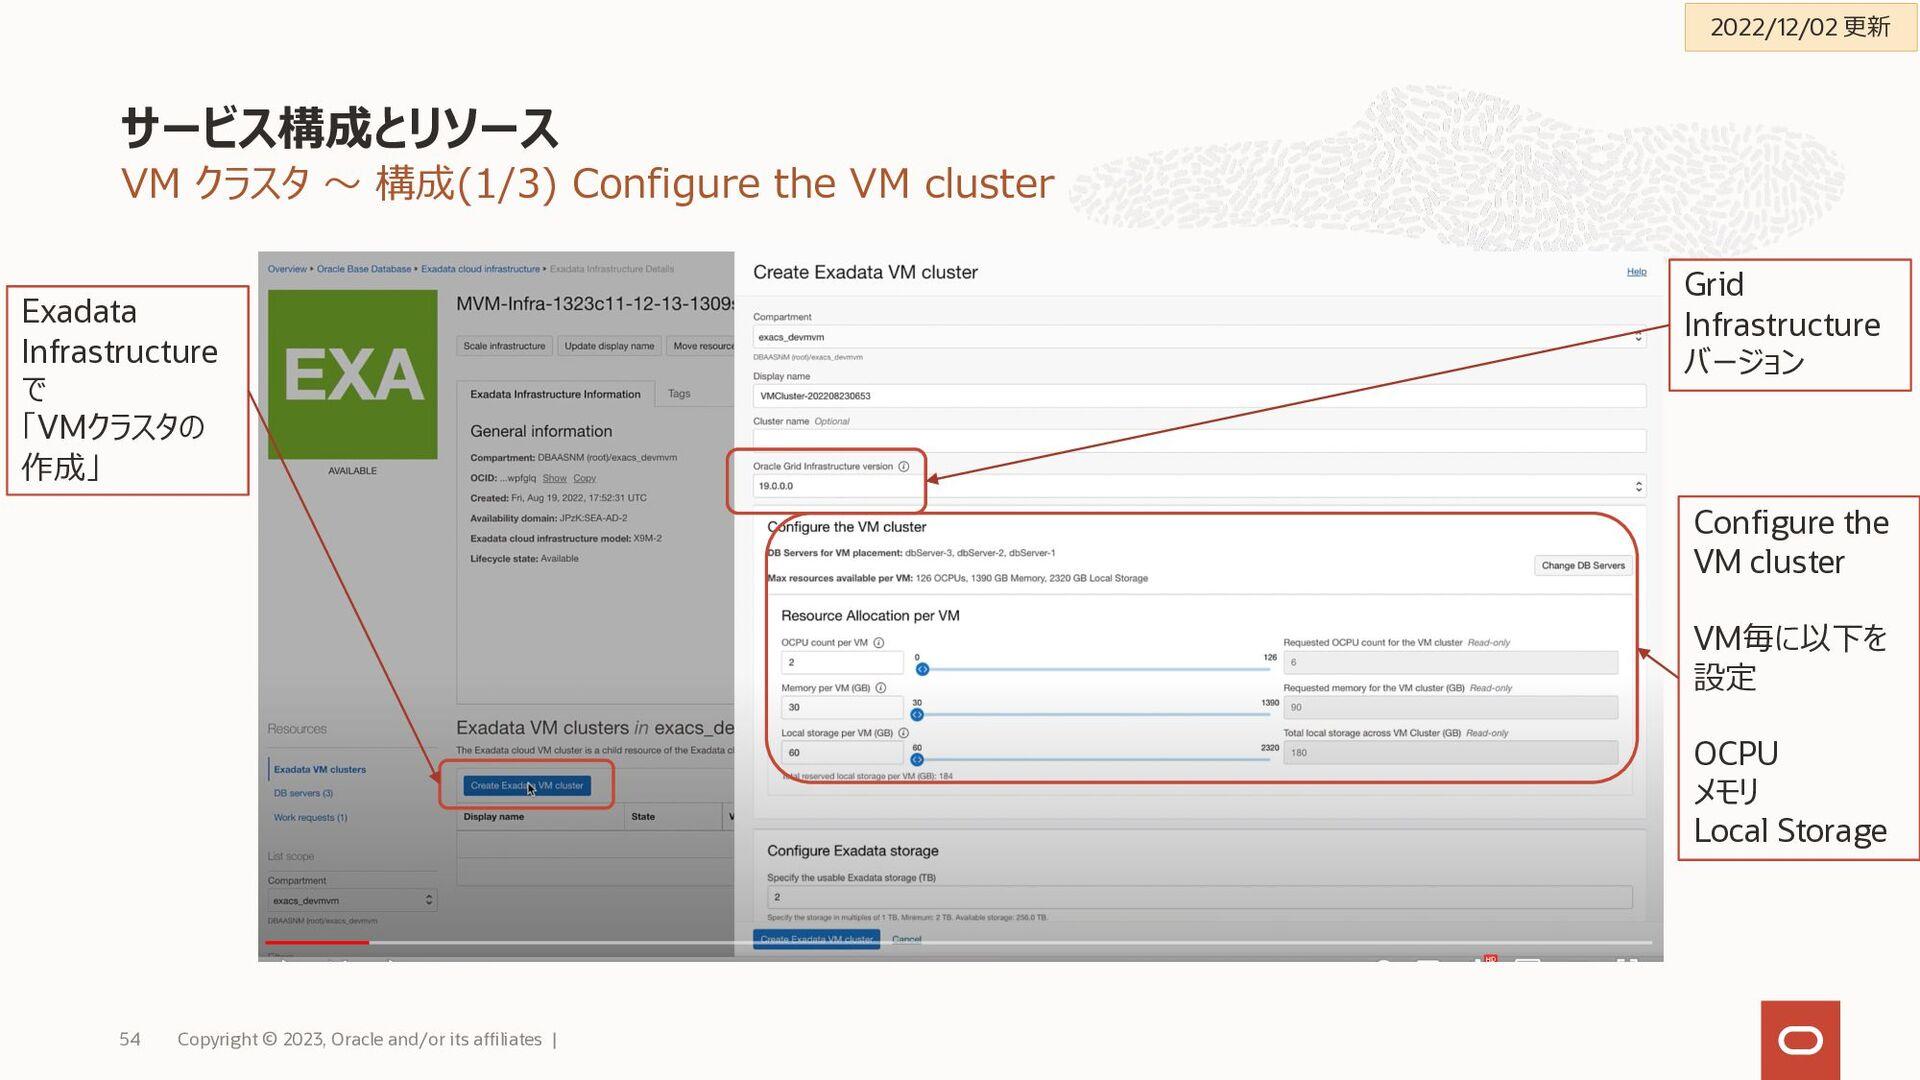 Exadata OCPU • OCPU スケールアップ・ダウンが可能 • OCPU 数を 0 ...